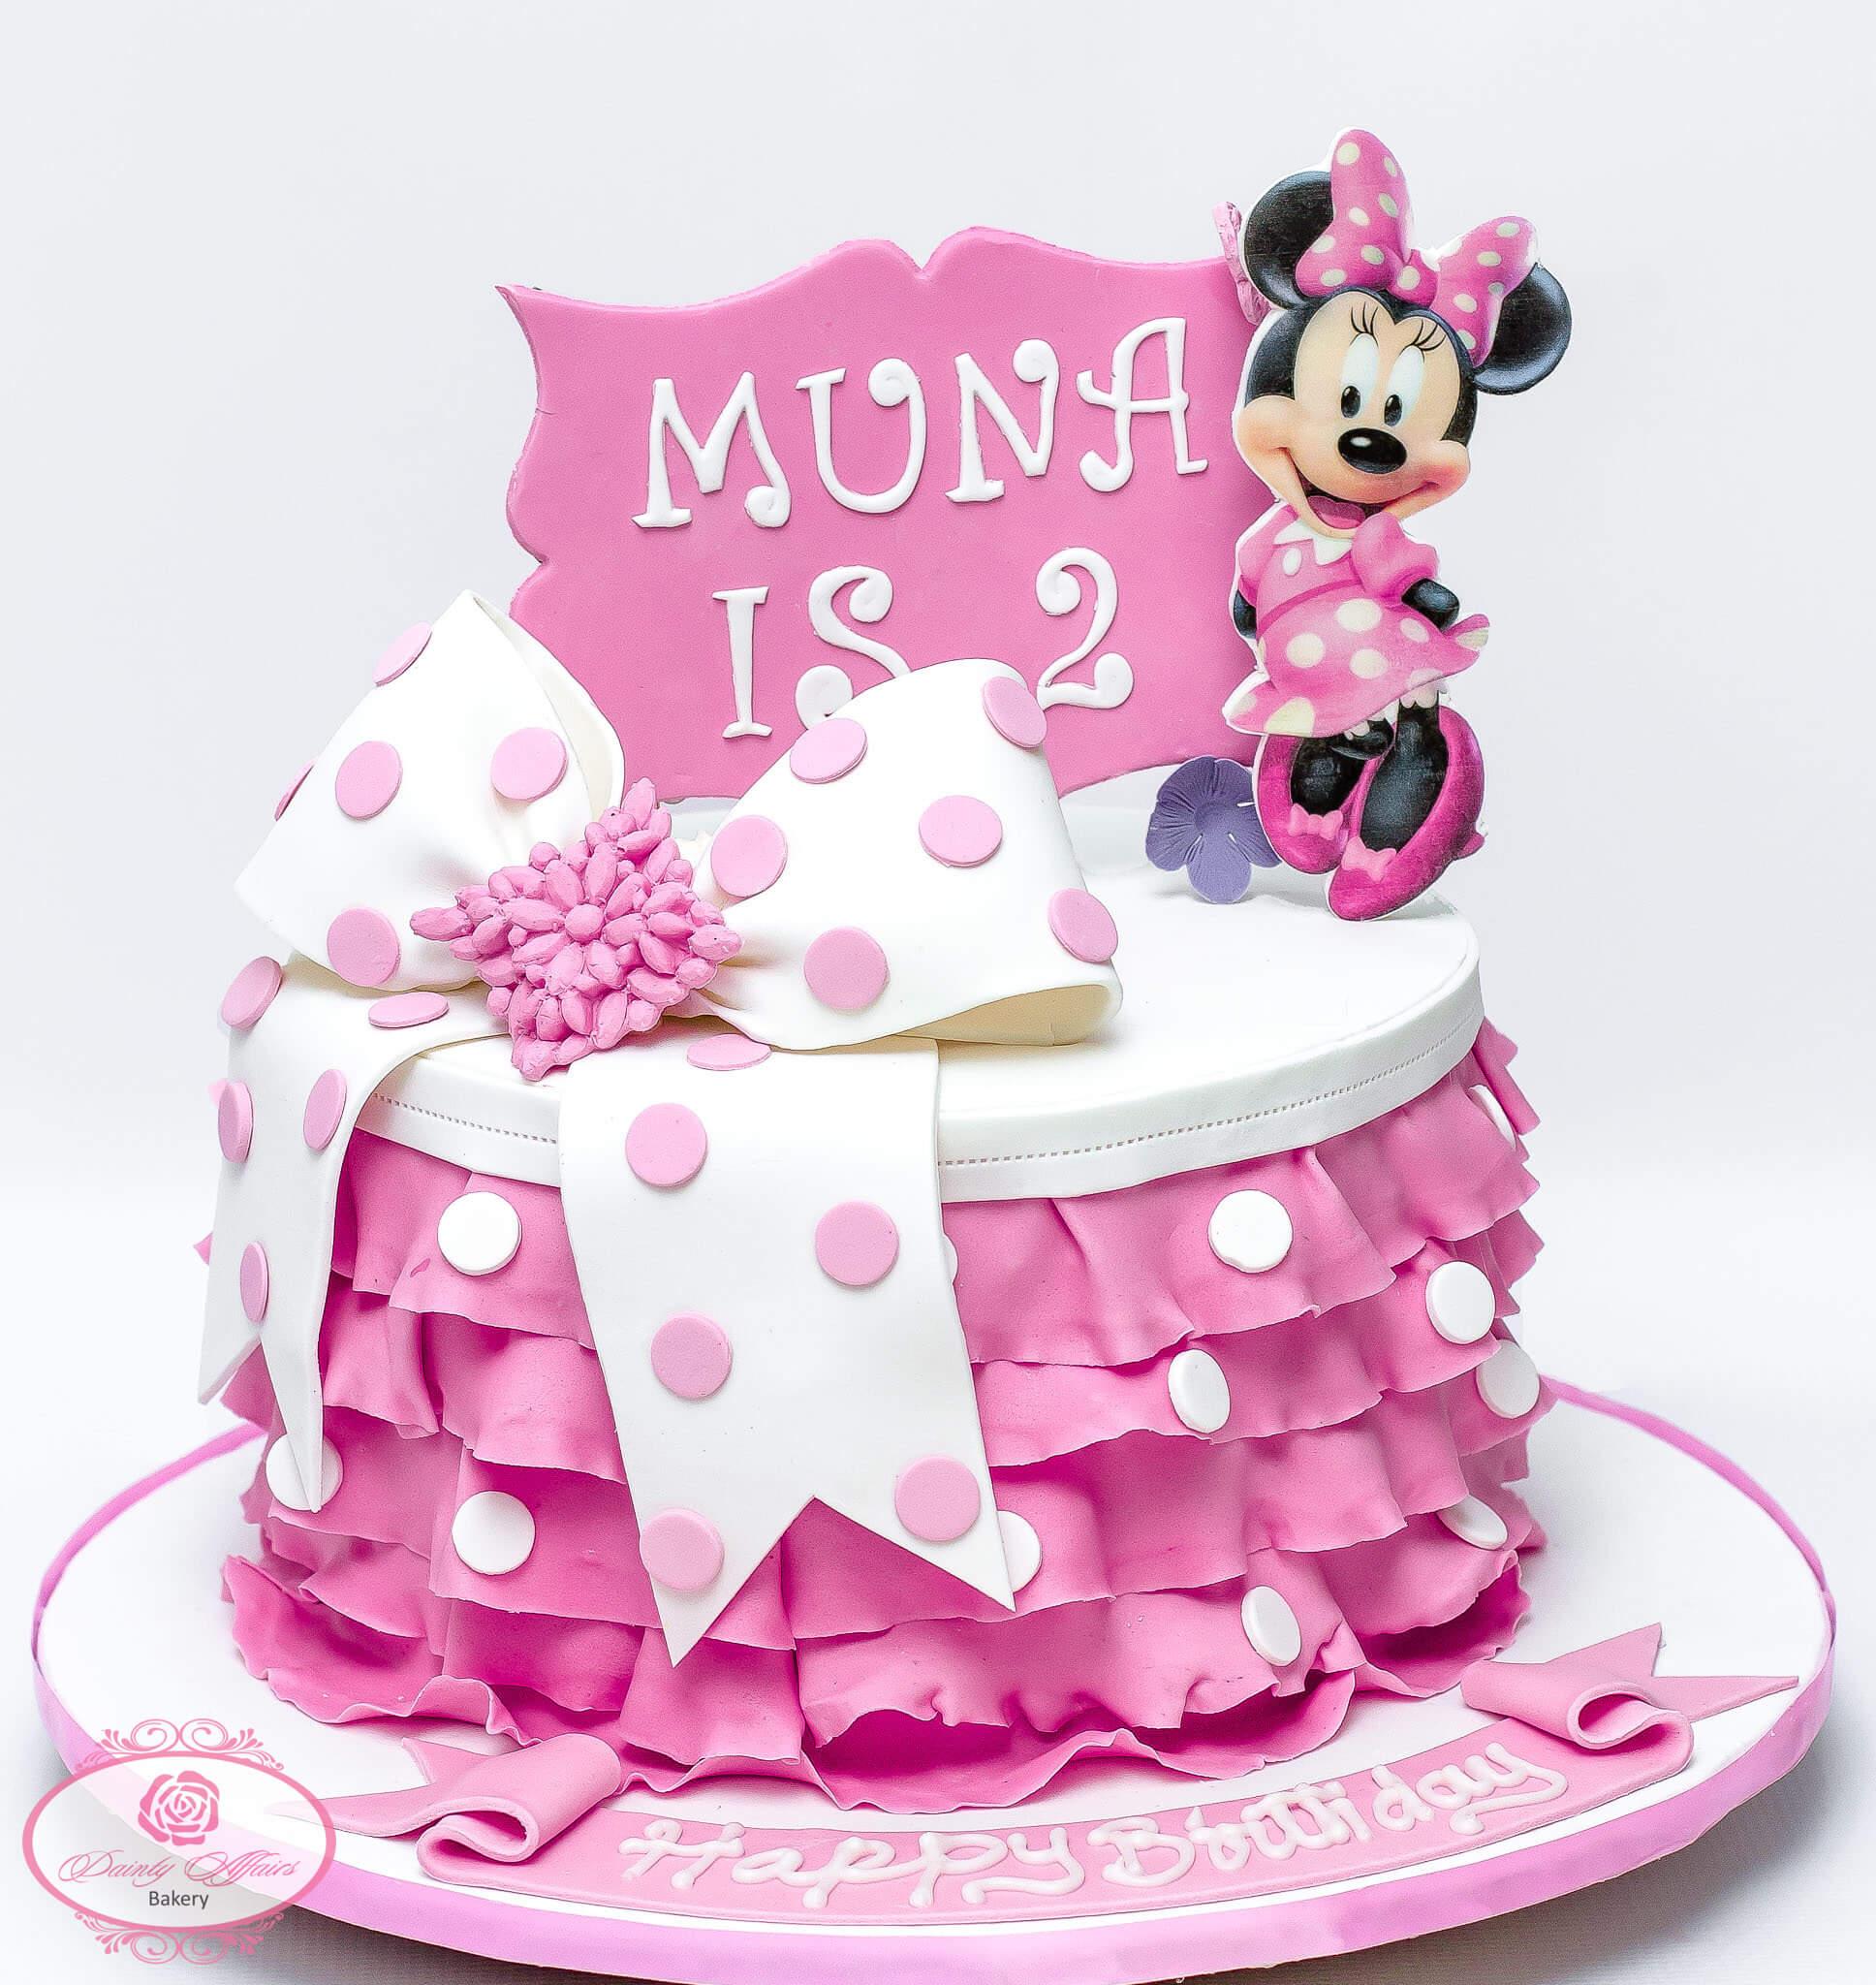 Minnie Mouse Fondant Cake Dainty Affairs Bakery Cakes Cupcakes